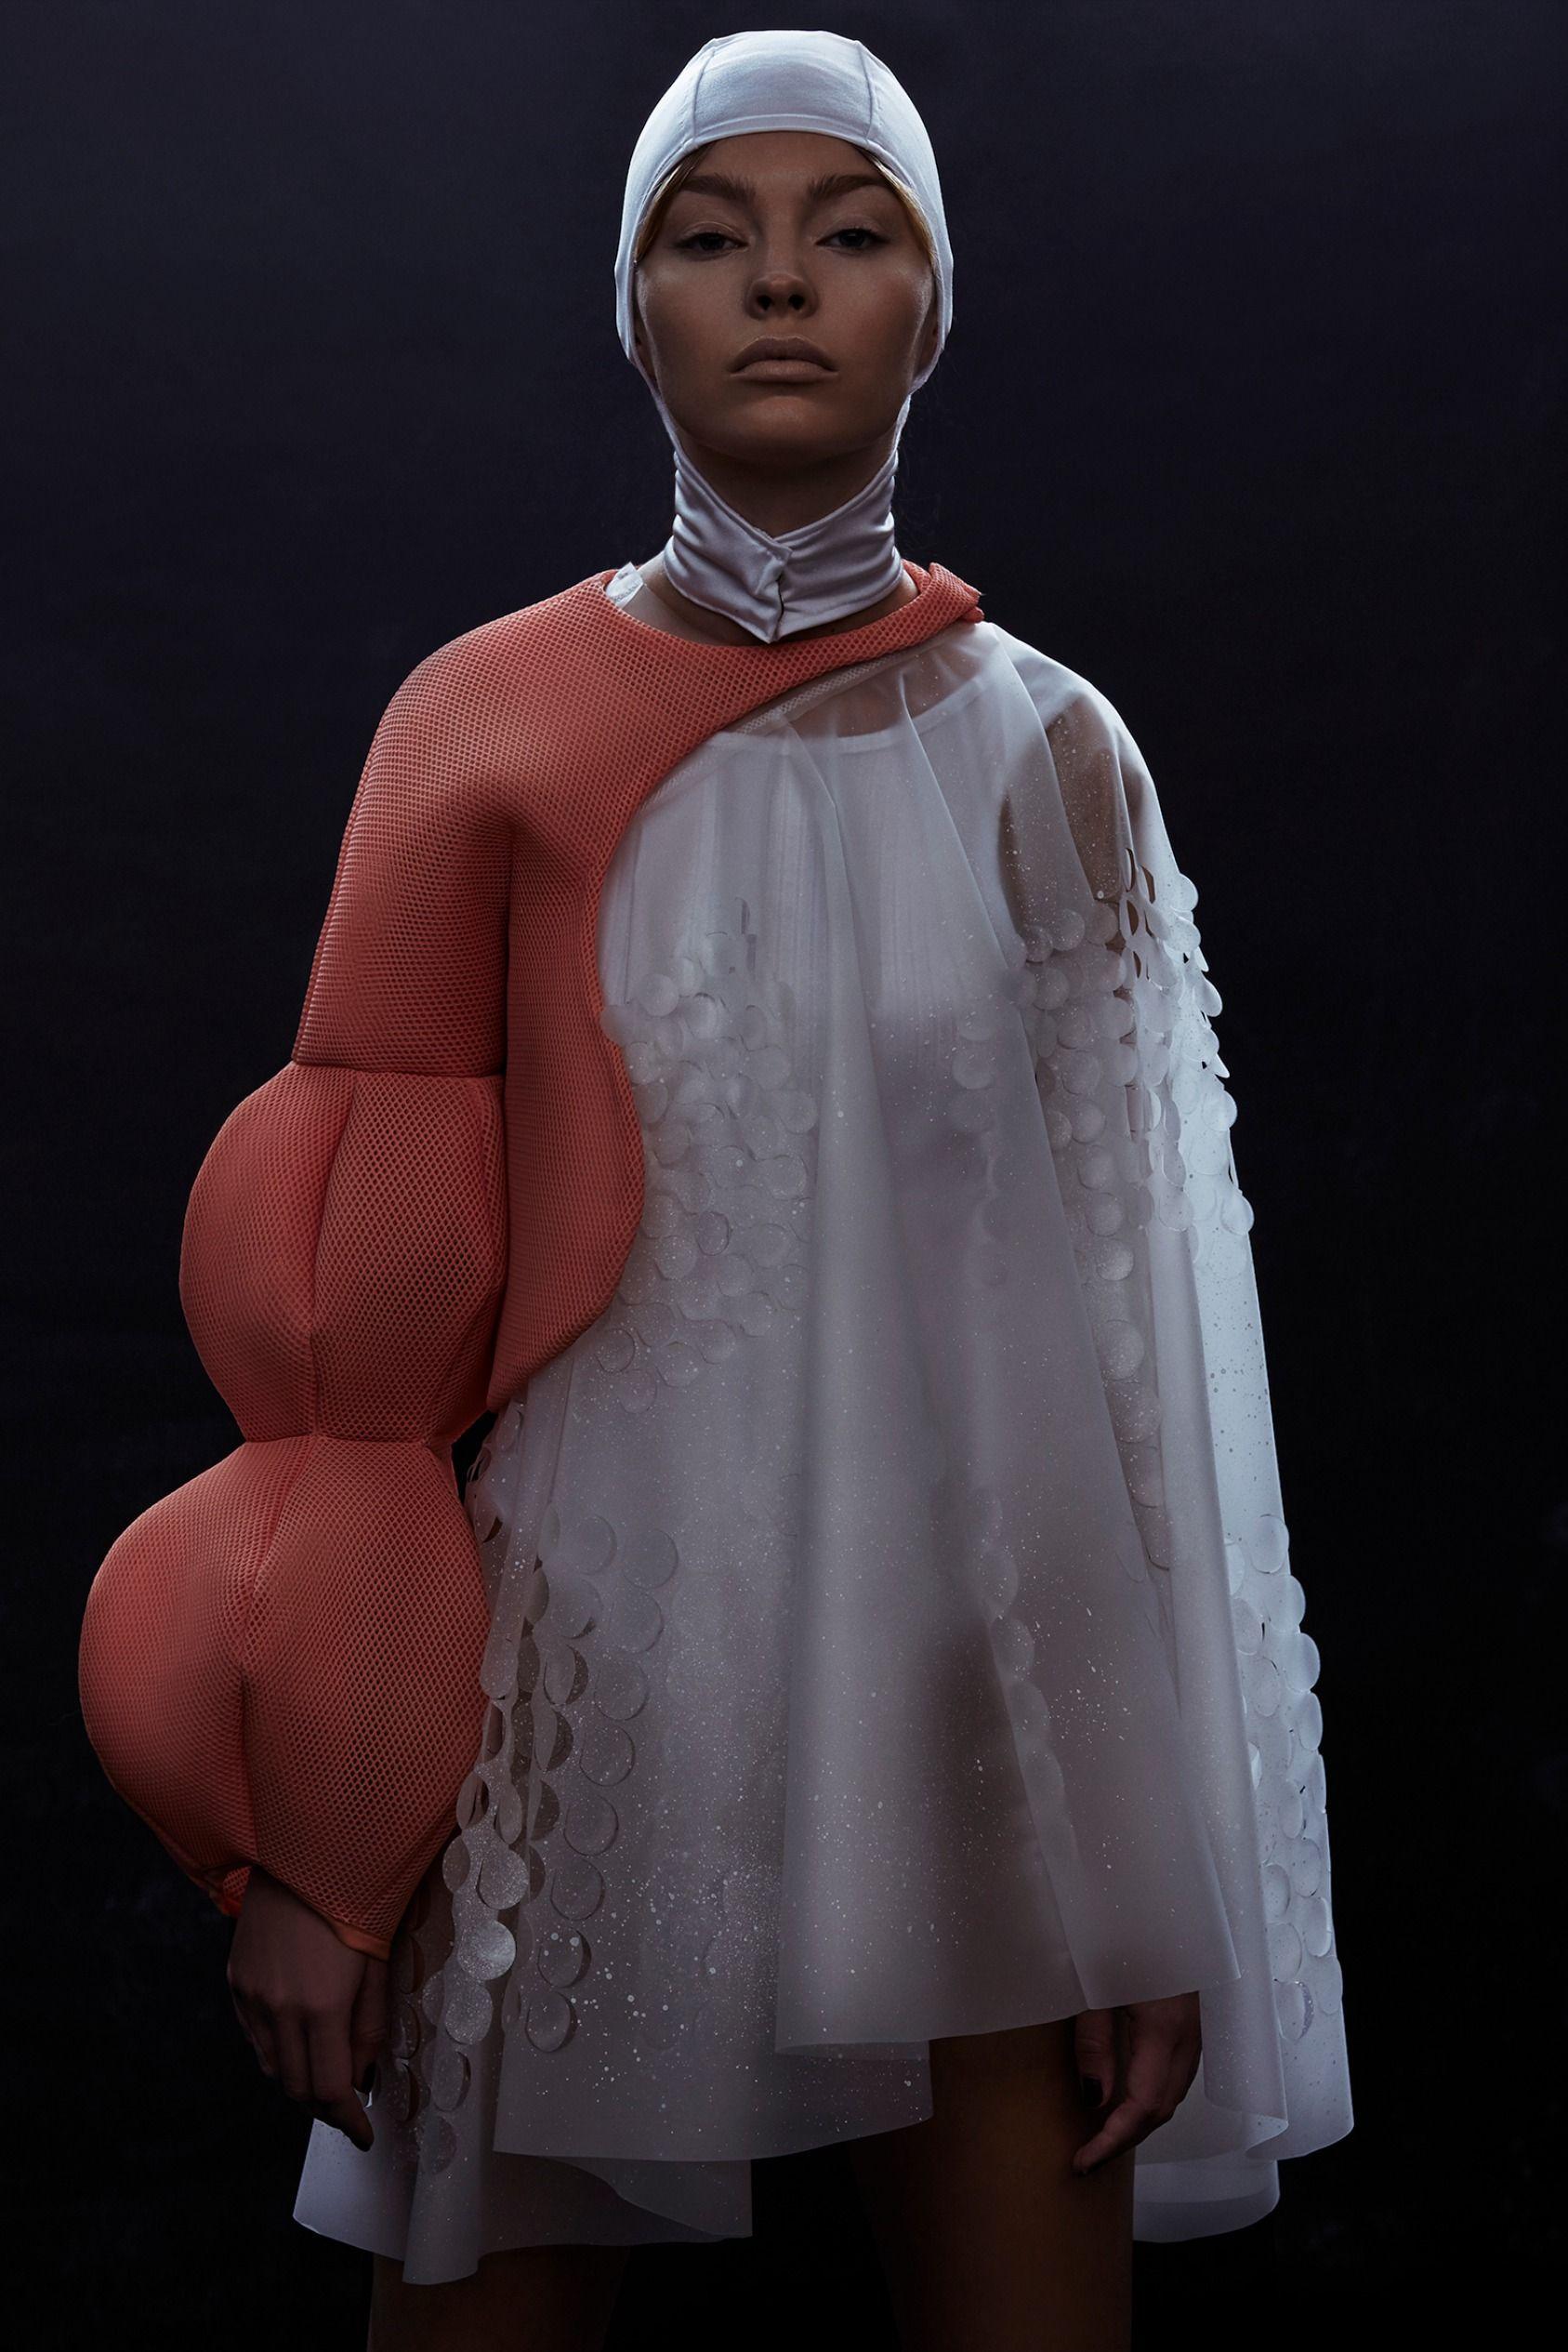 Asylum Artsthread Conceptual Fashion Fashion Fashion Design